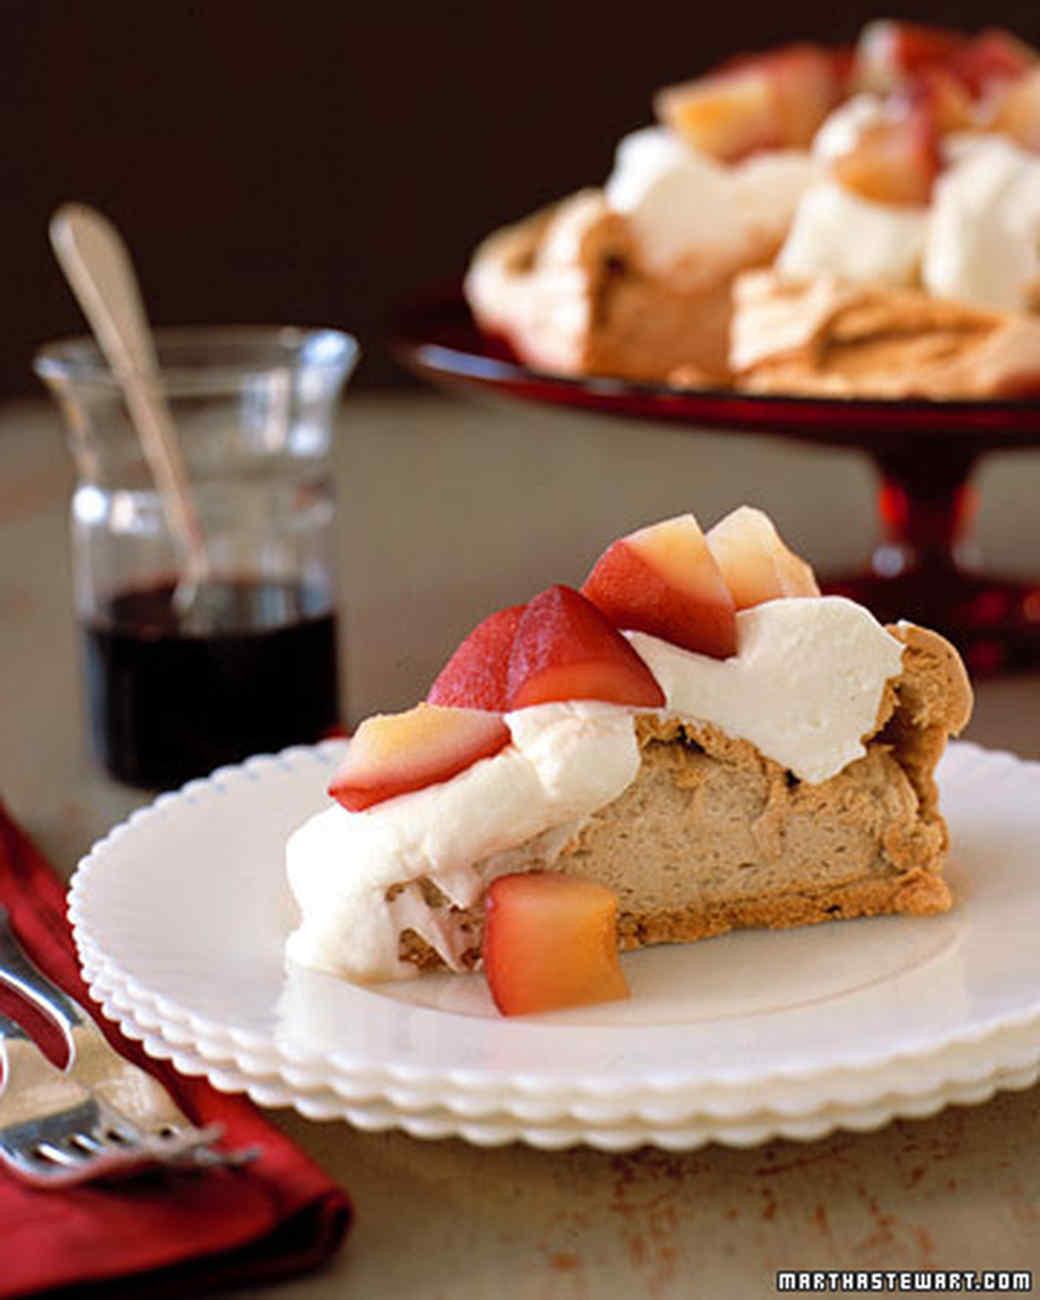 Thanksgiving Dessert Recipes  Our Food Editors Favorite Thanksgiving Dessert Recipes